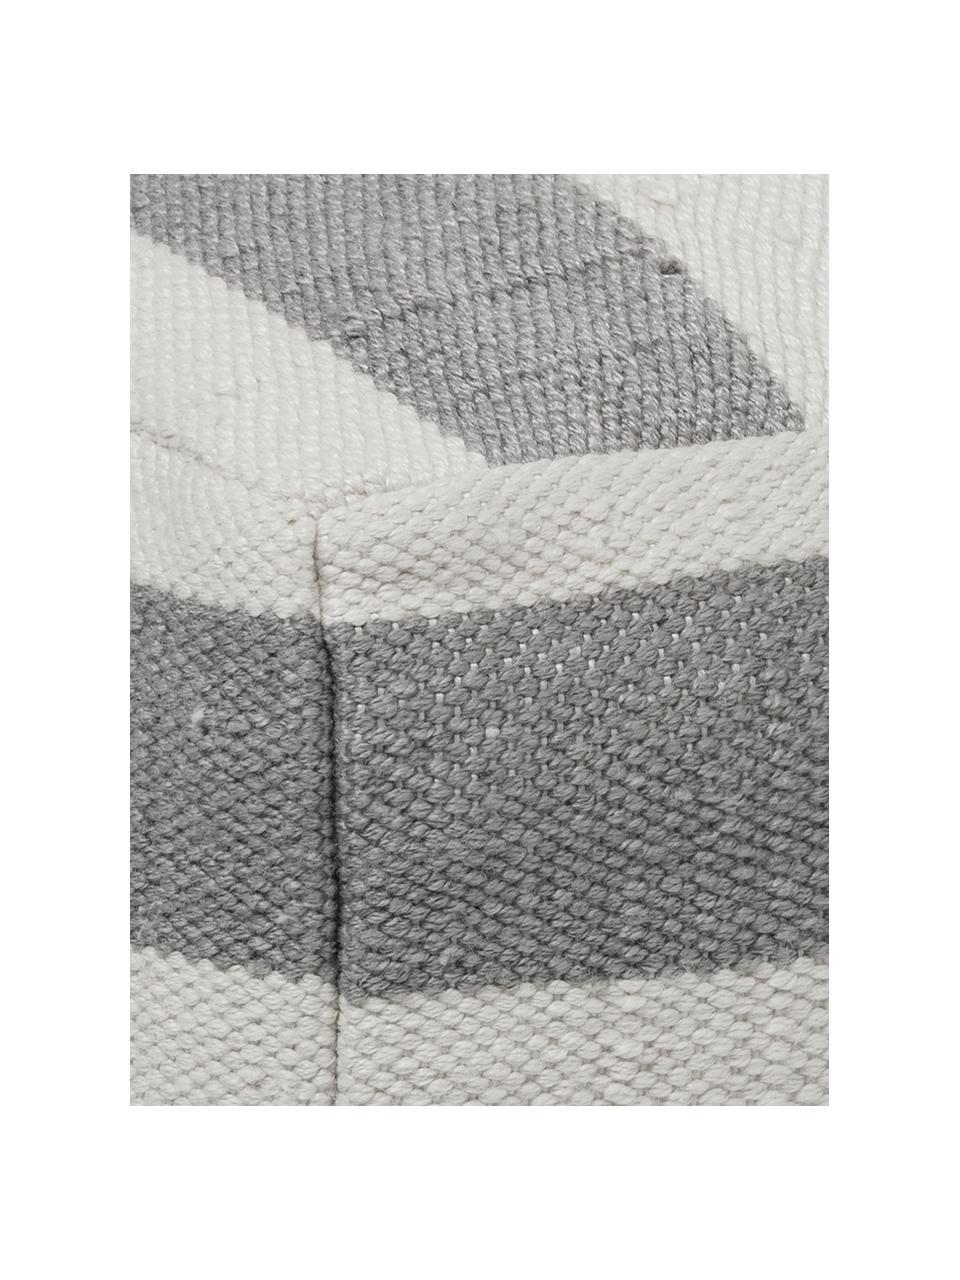 Cojín de suelo artesanal para interior/exterior Lani, Funda: 100%poliéster reciclado, Gris, crudo, An 63 x Al 30 cm